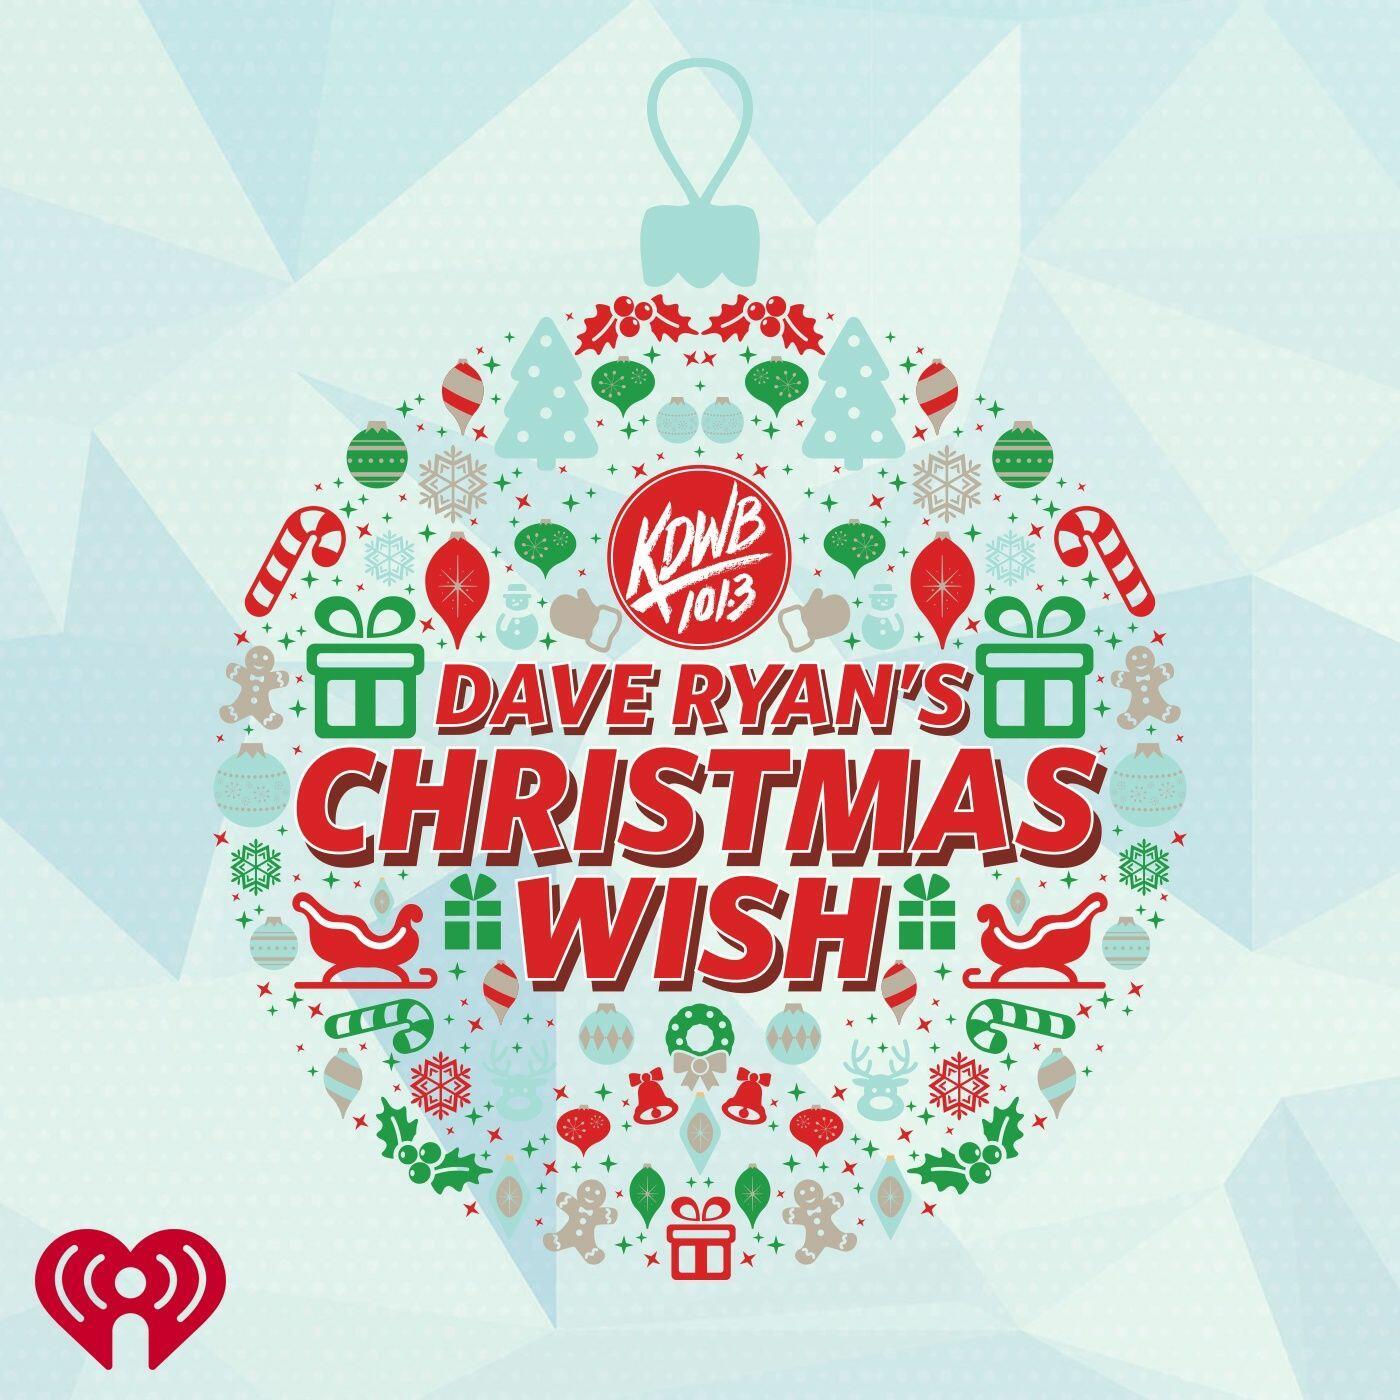 Dave Ryan's Christmas Wish